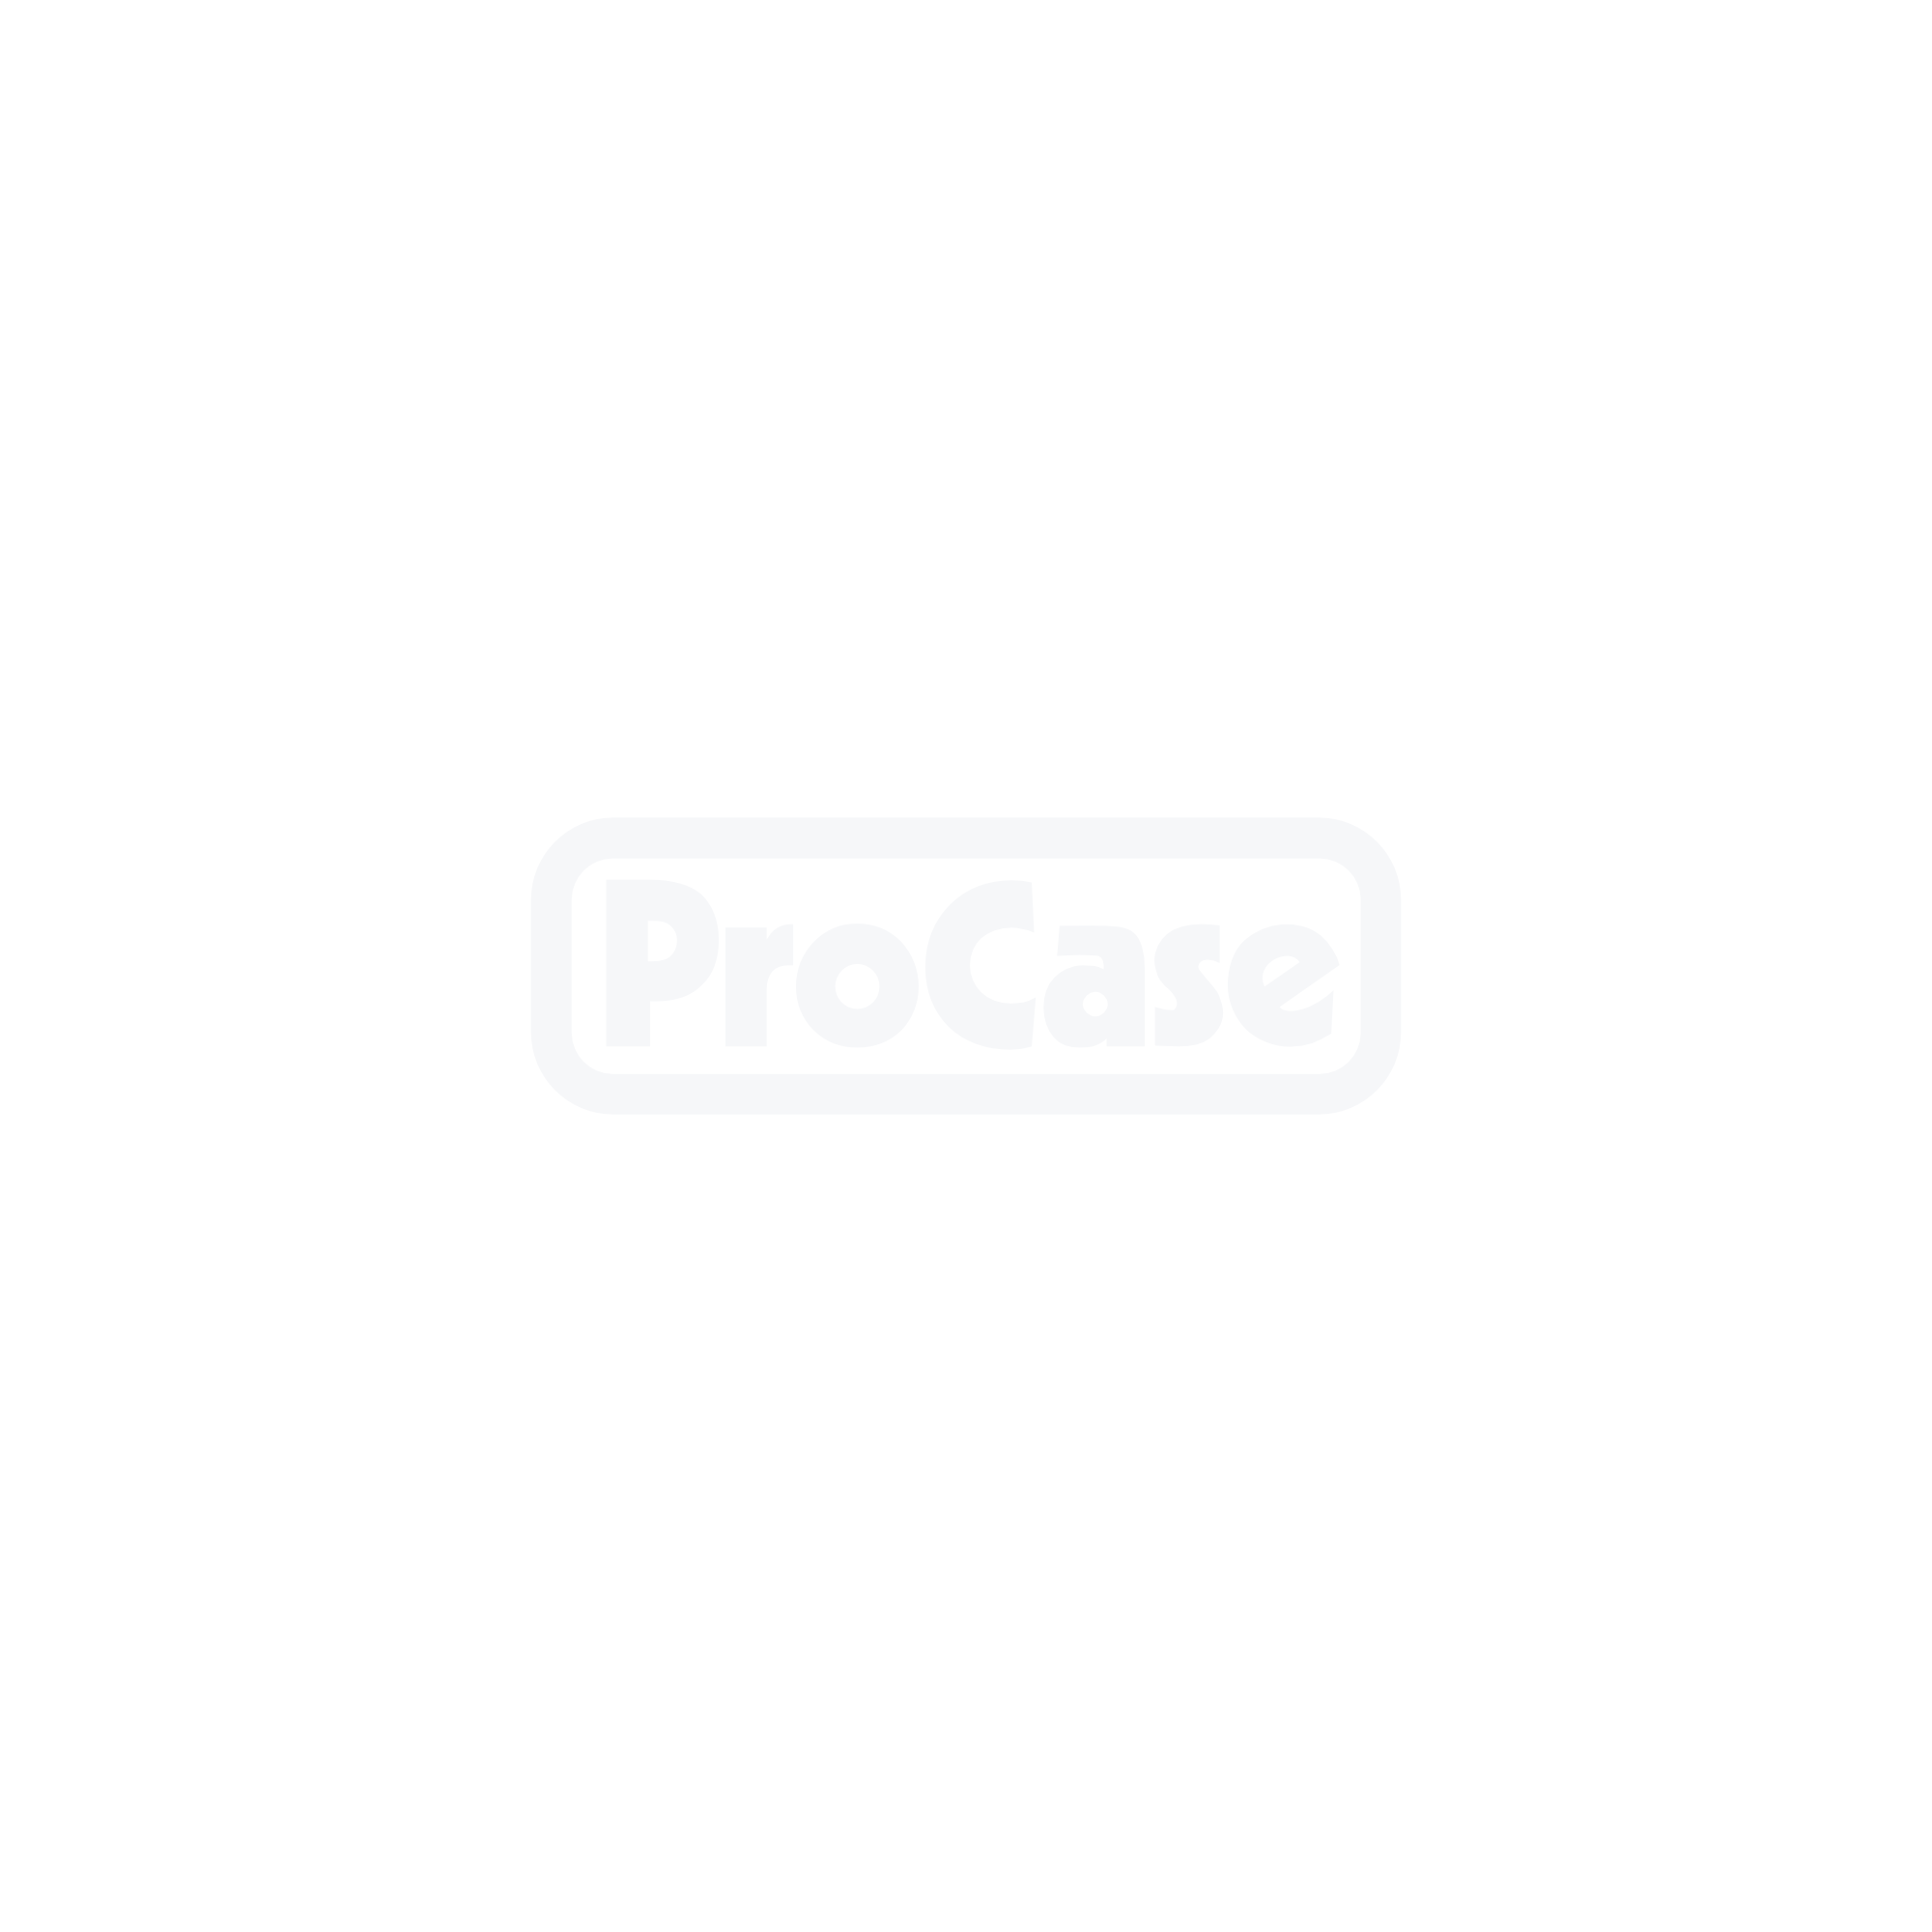 Flightcase für 6 Mikrofonstative + 6 Boxenstative 2